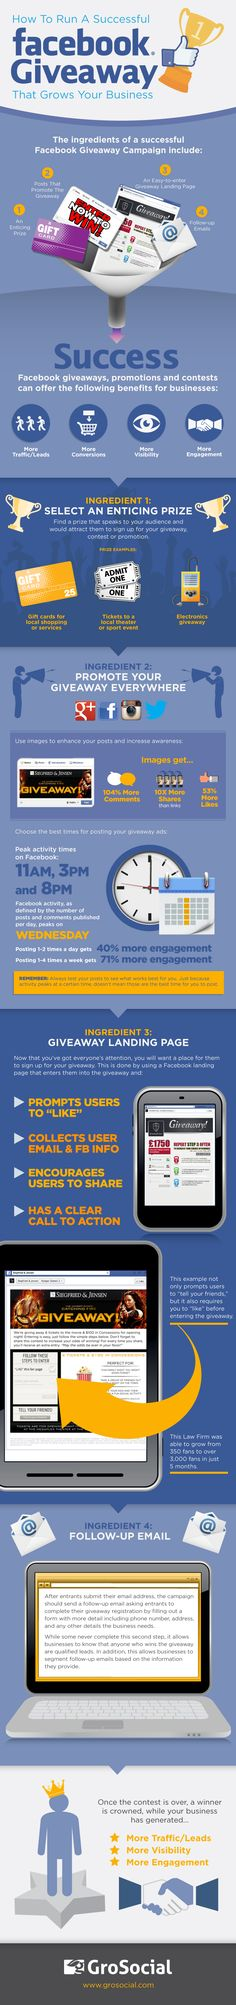 FaceBook Promotion: How to Run a Successful Facebook Contest  #facebookmarketing